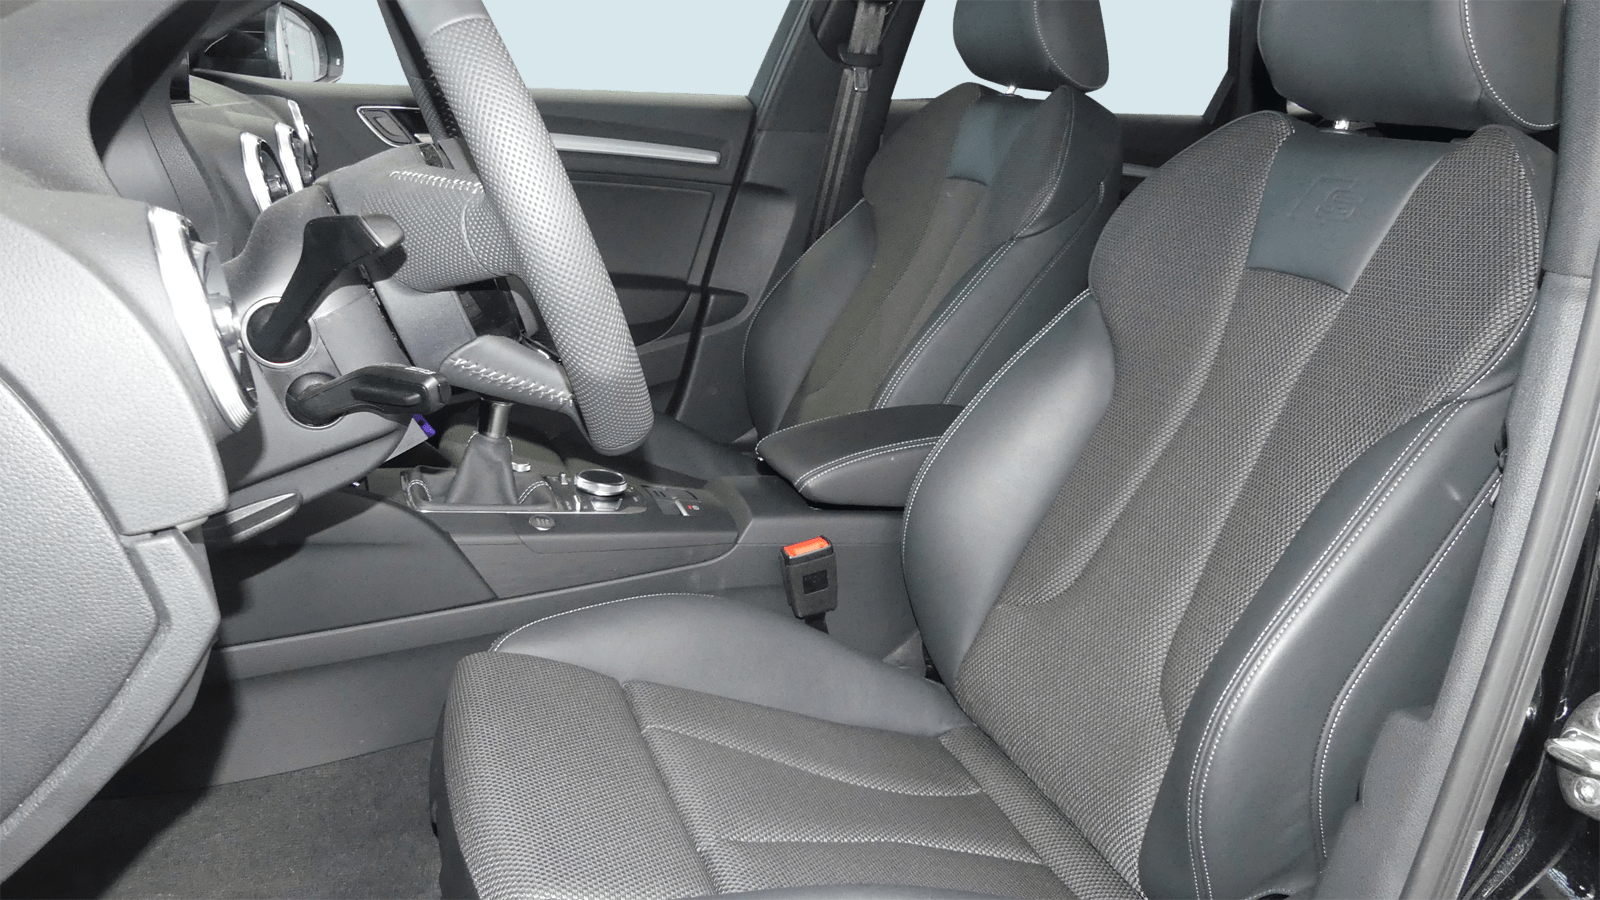 Audi A3 Sportback Black - Clyde car subscription